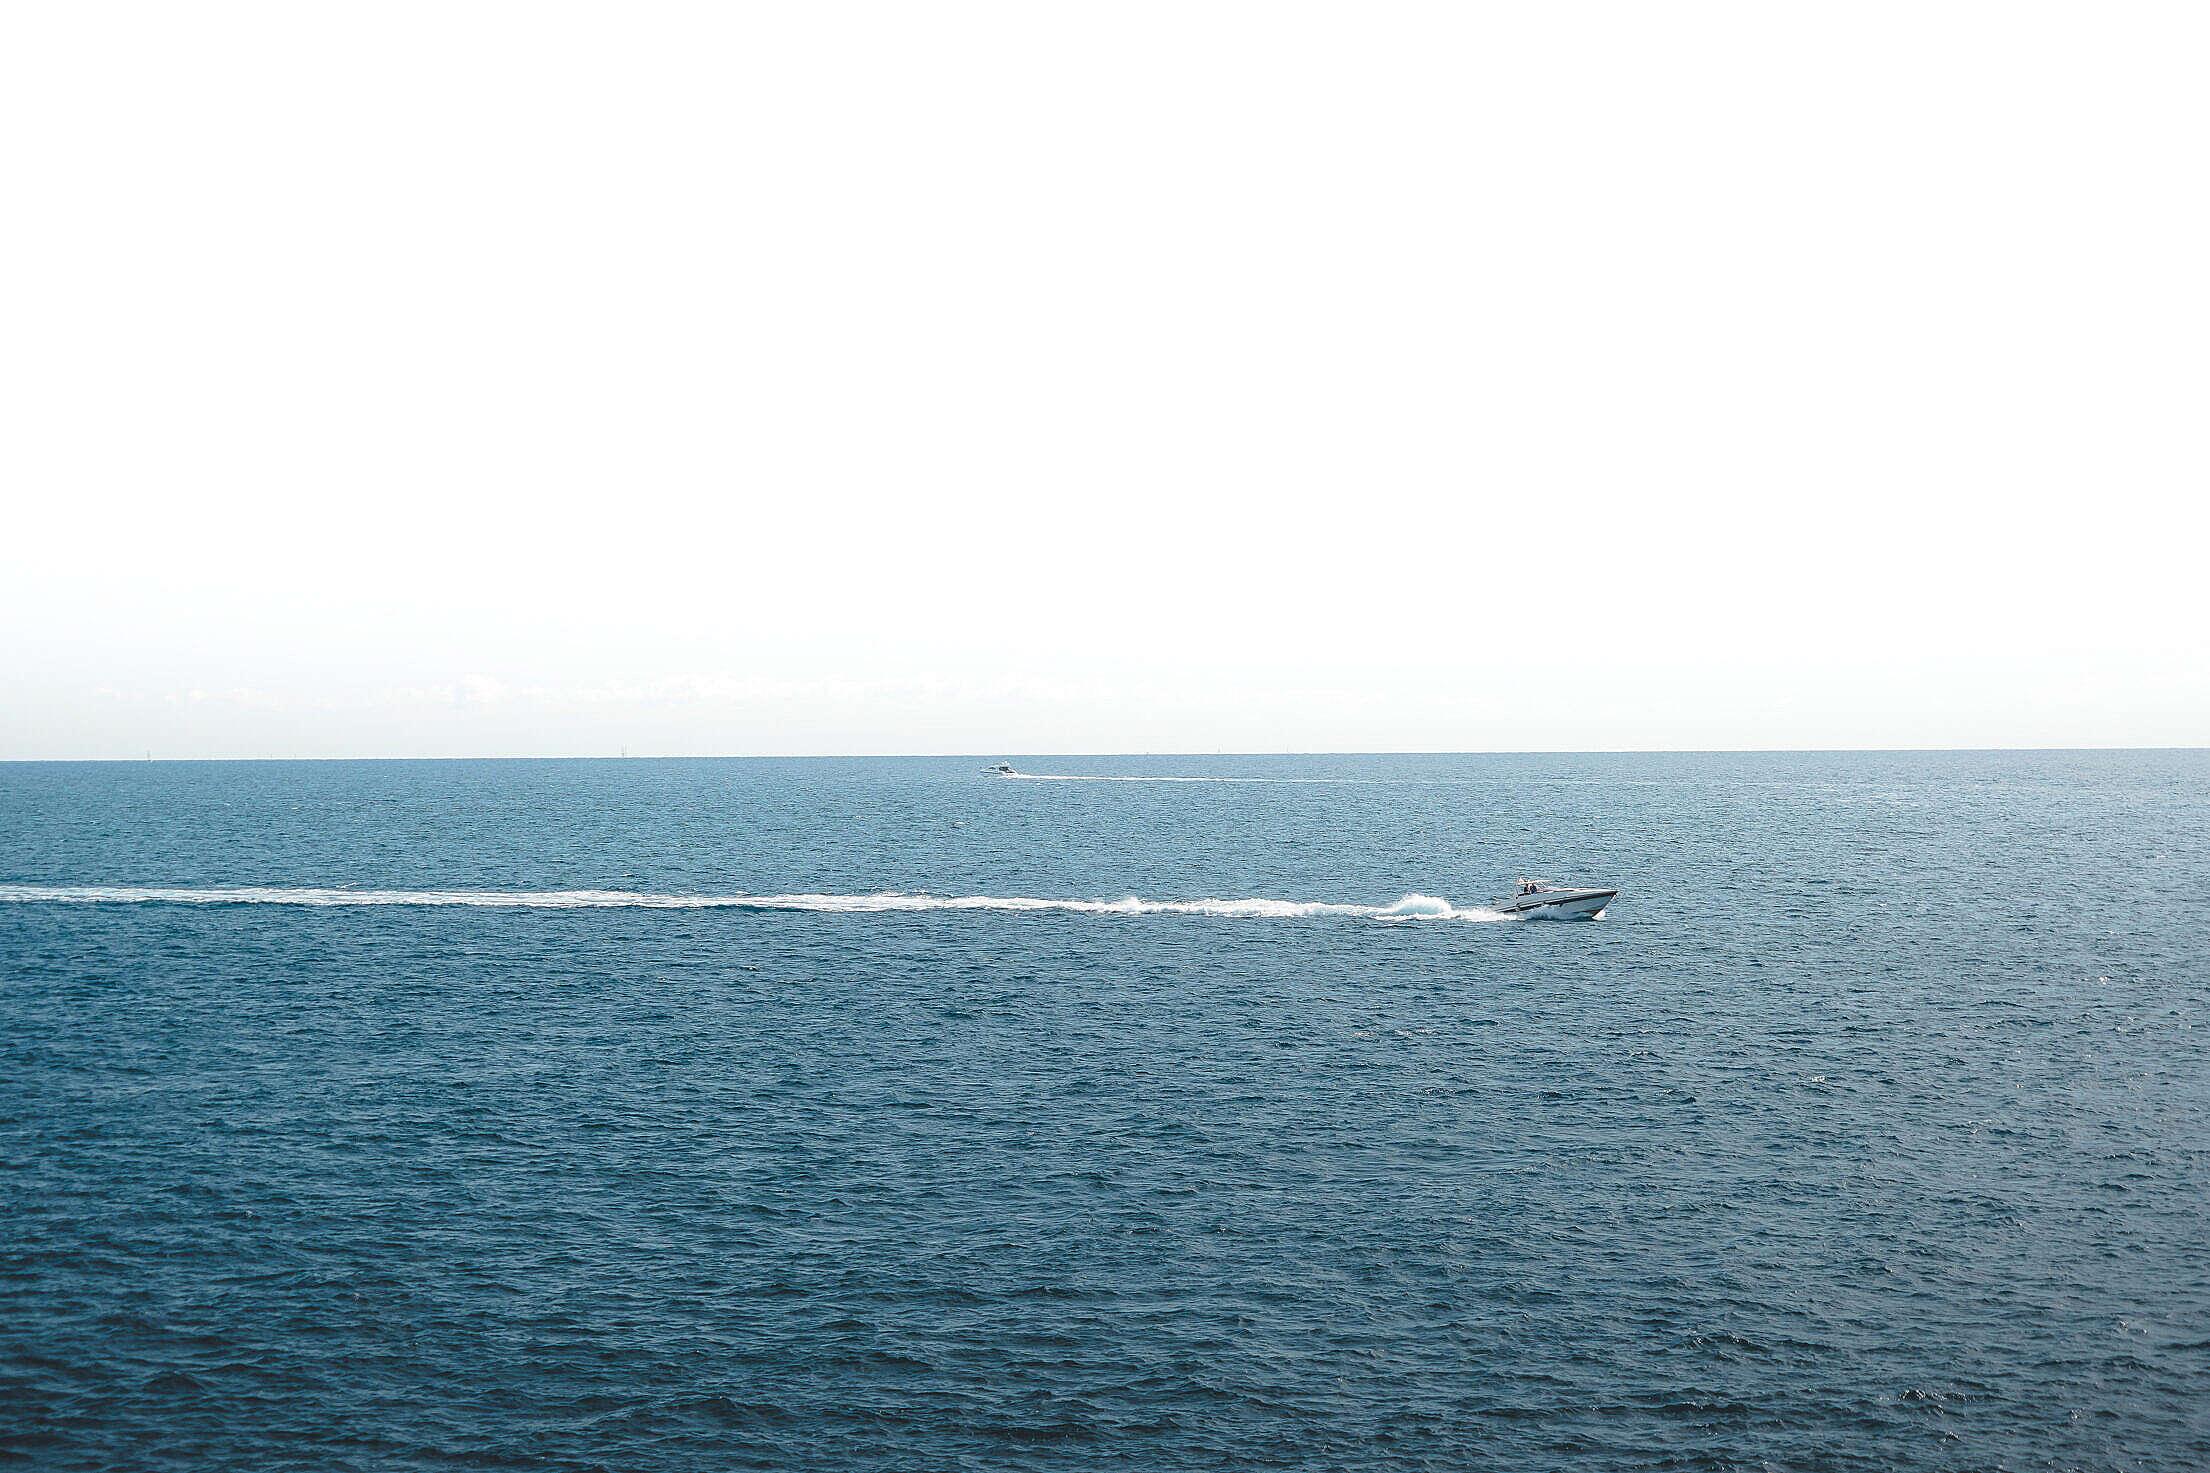 Boat at Sea Leaving a Wake Free Stock Photo